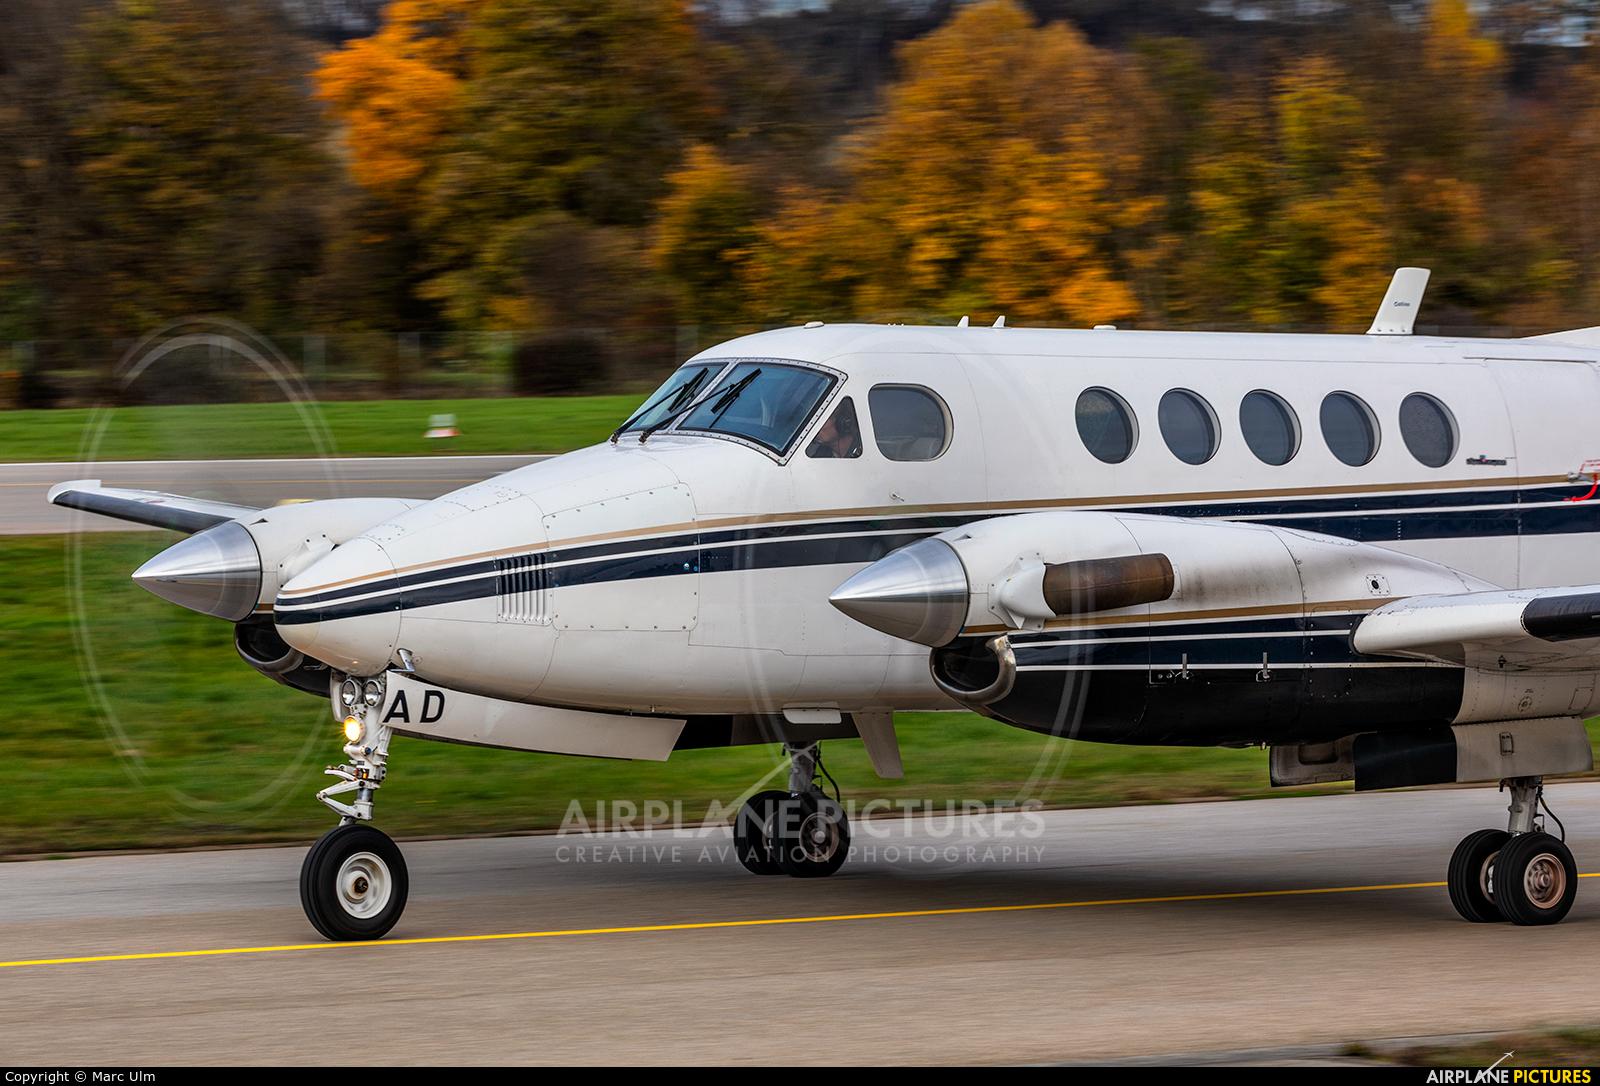 PTL Luftfahrtunternehmen D-IBAD aircraft at Augsburg